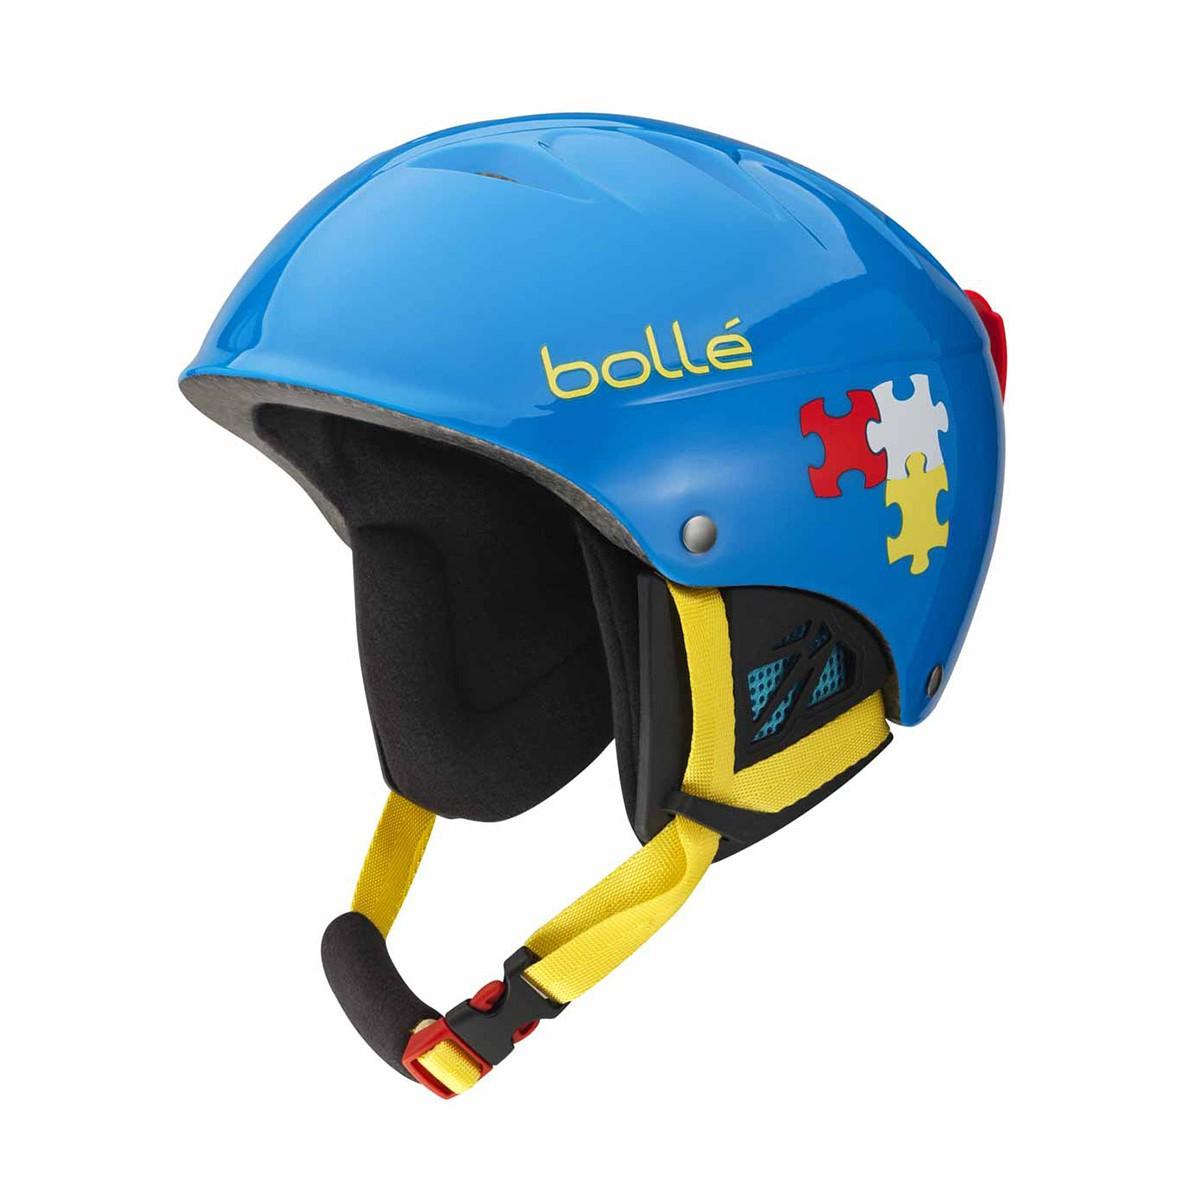 Casque De Protection Bolle B Kid Casque De Ski Enfant Inuka